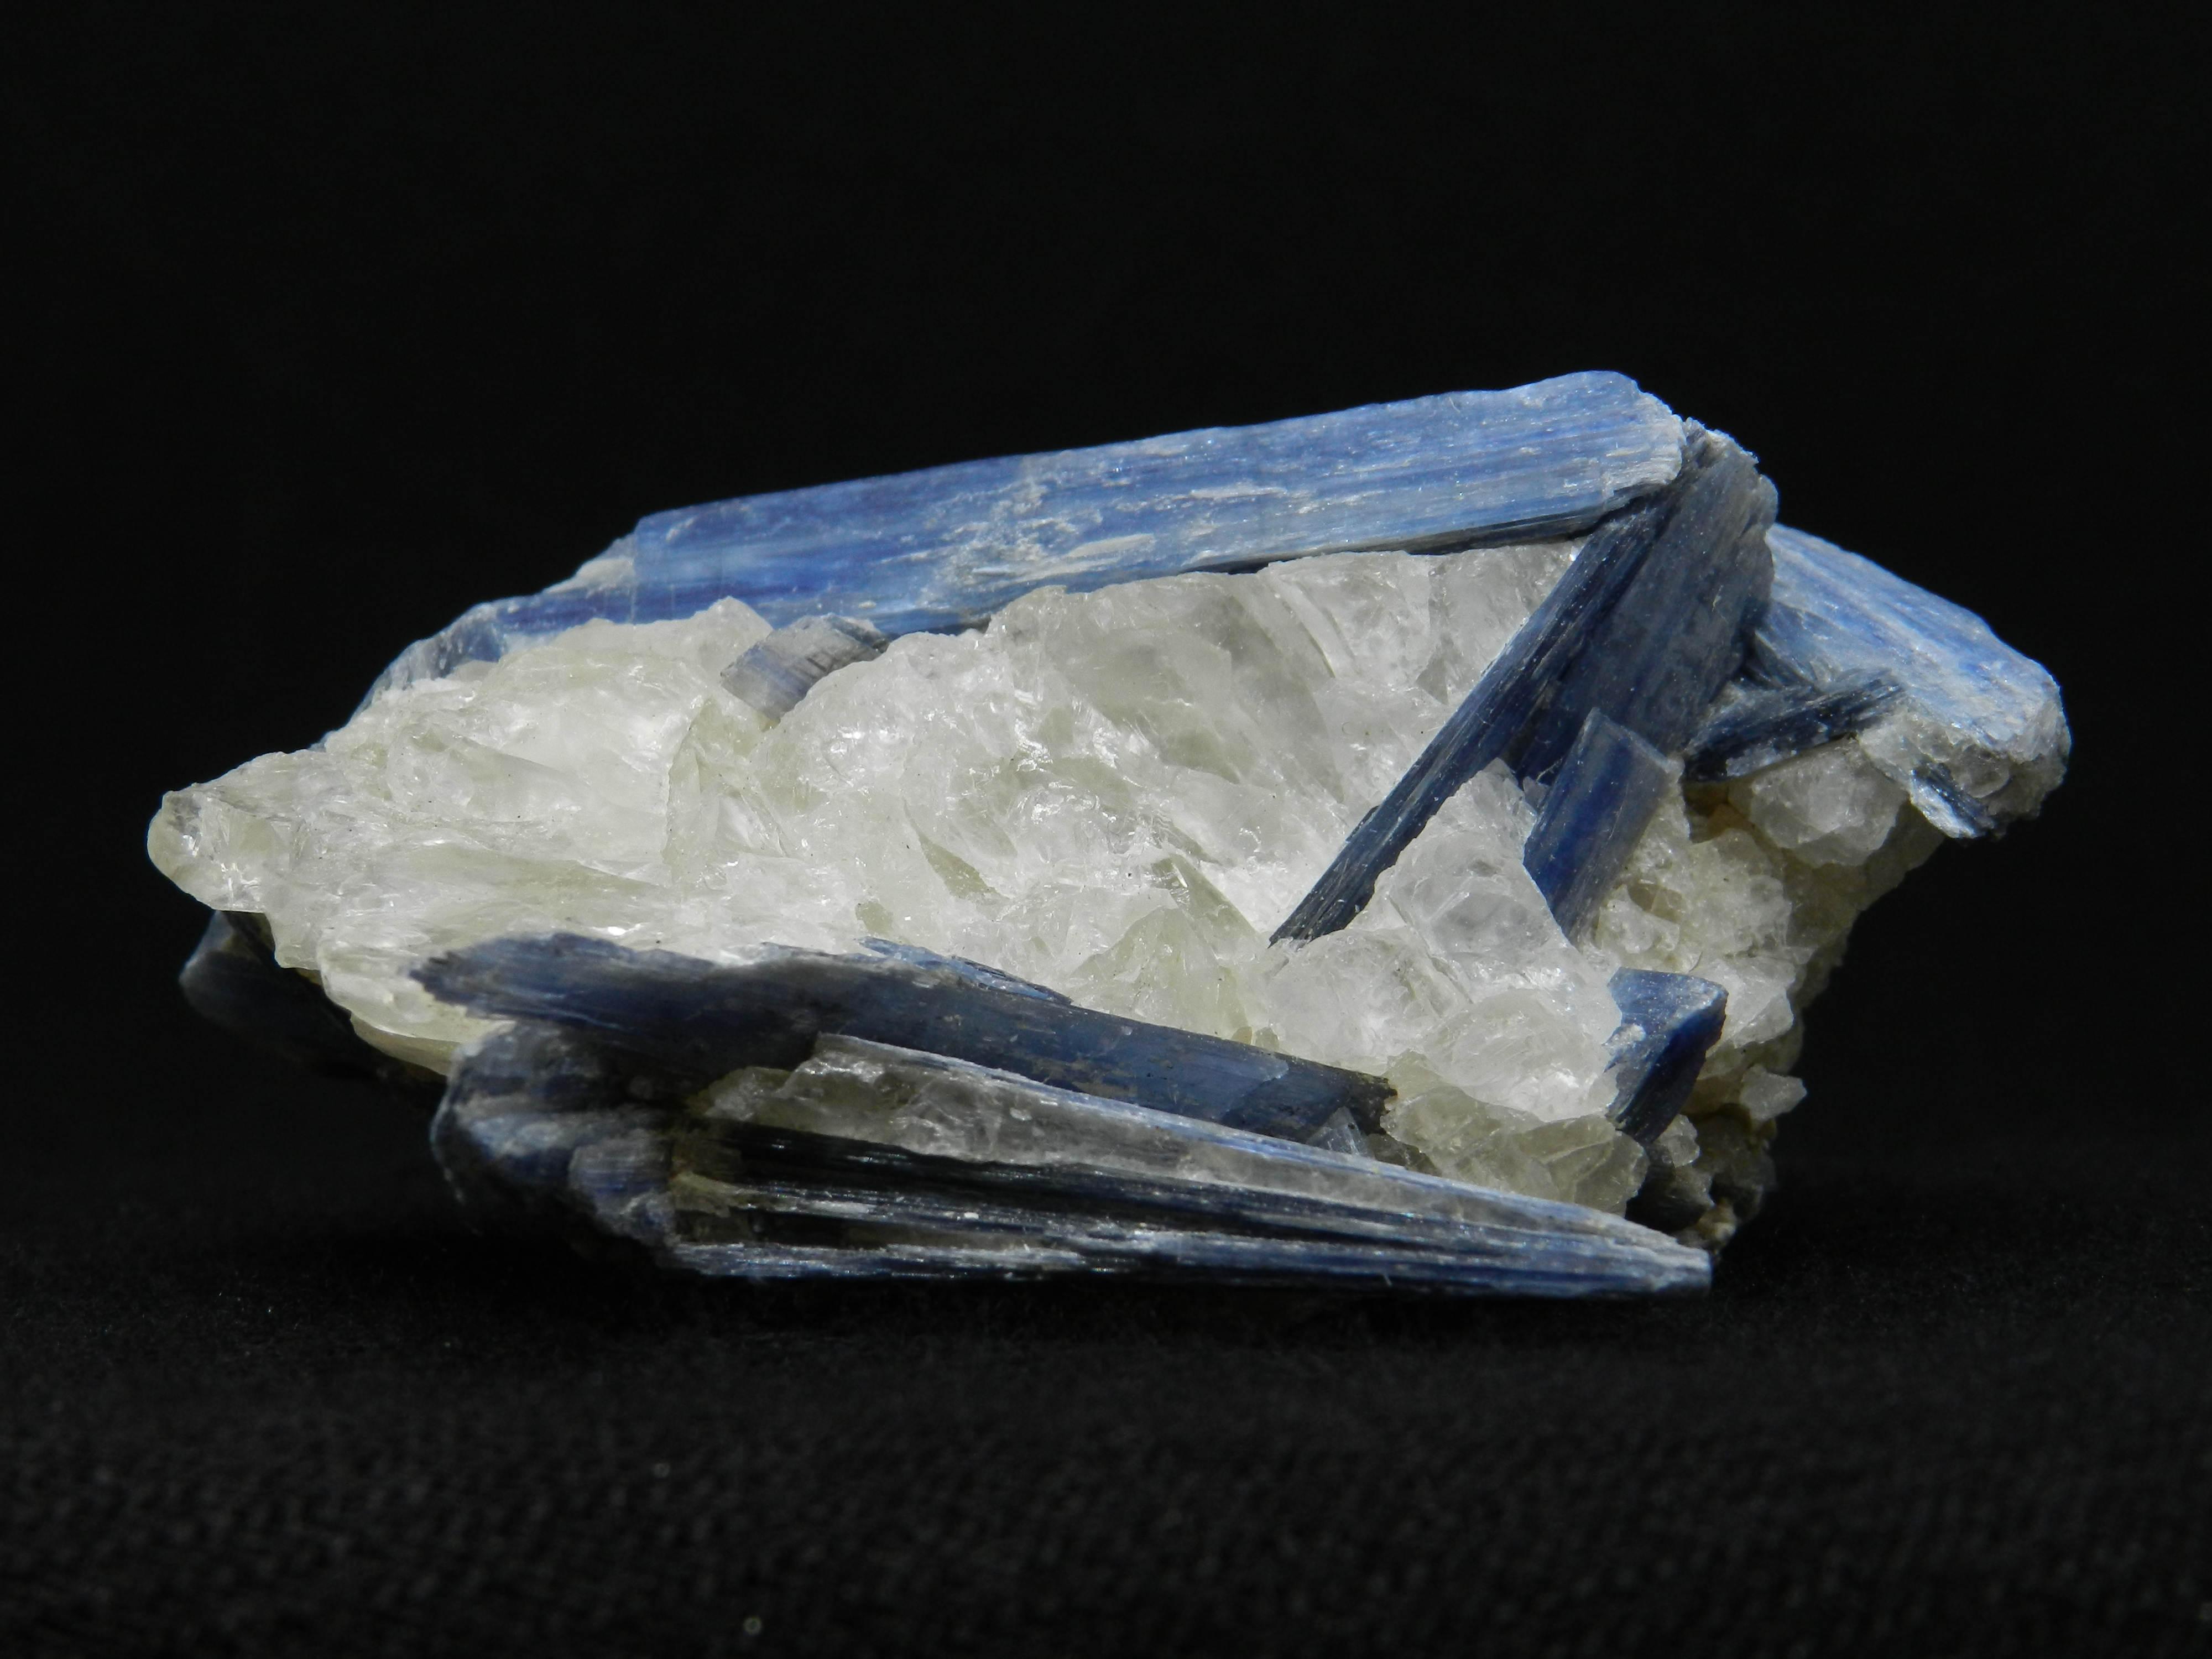 Close up image of Blue Kyanite